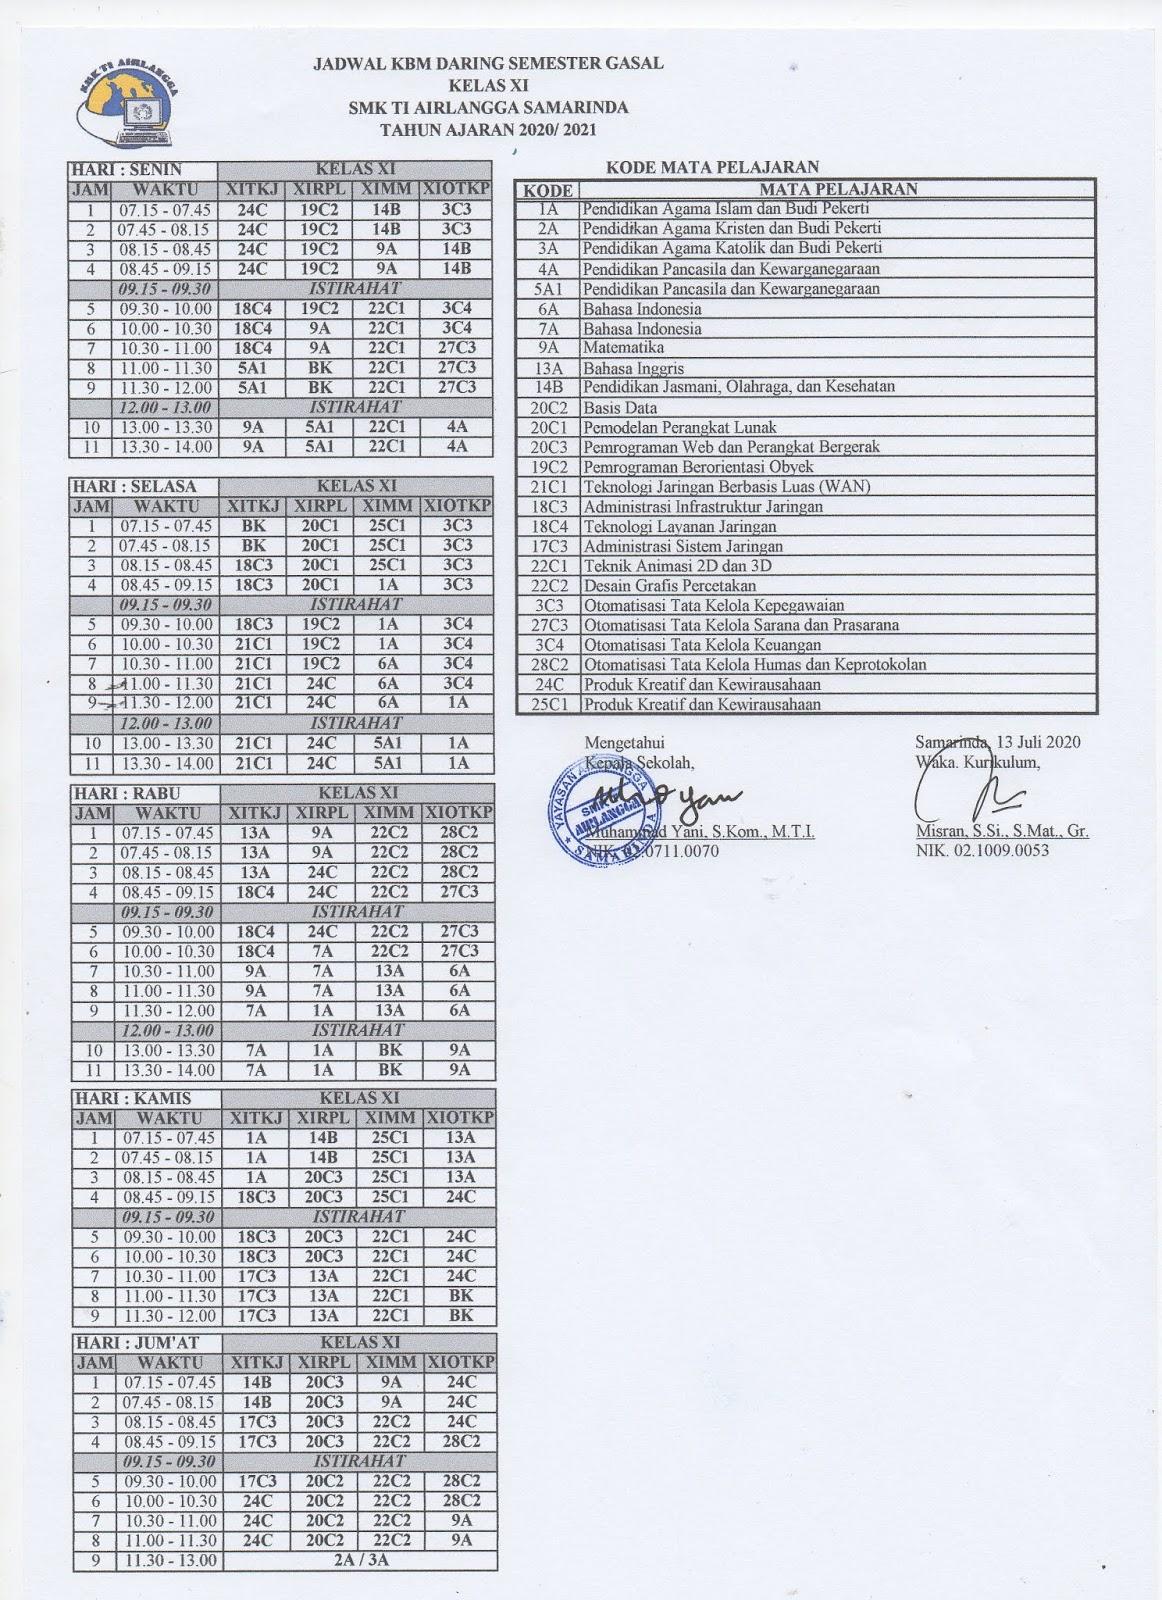 SMK TI Airlangga Samarinda: Jadwal KBM Daring Semester ...